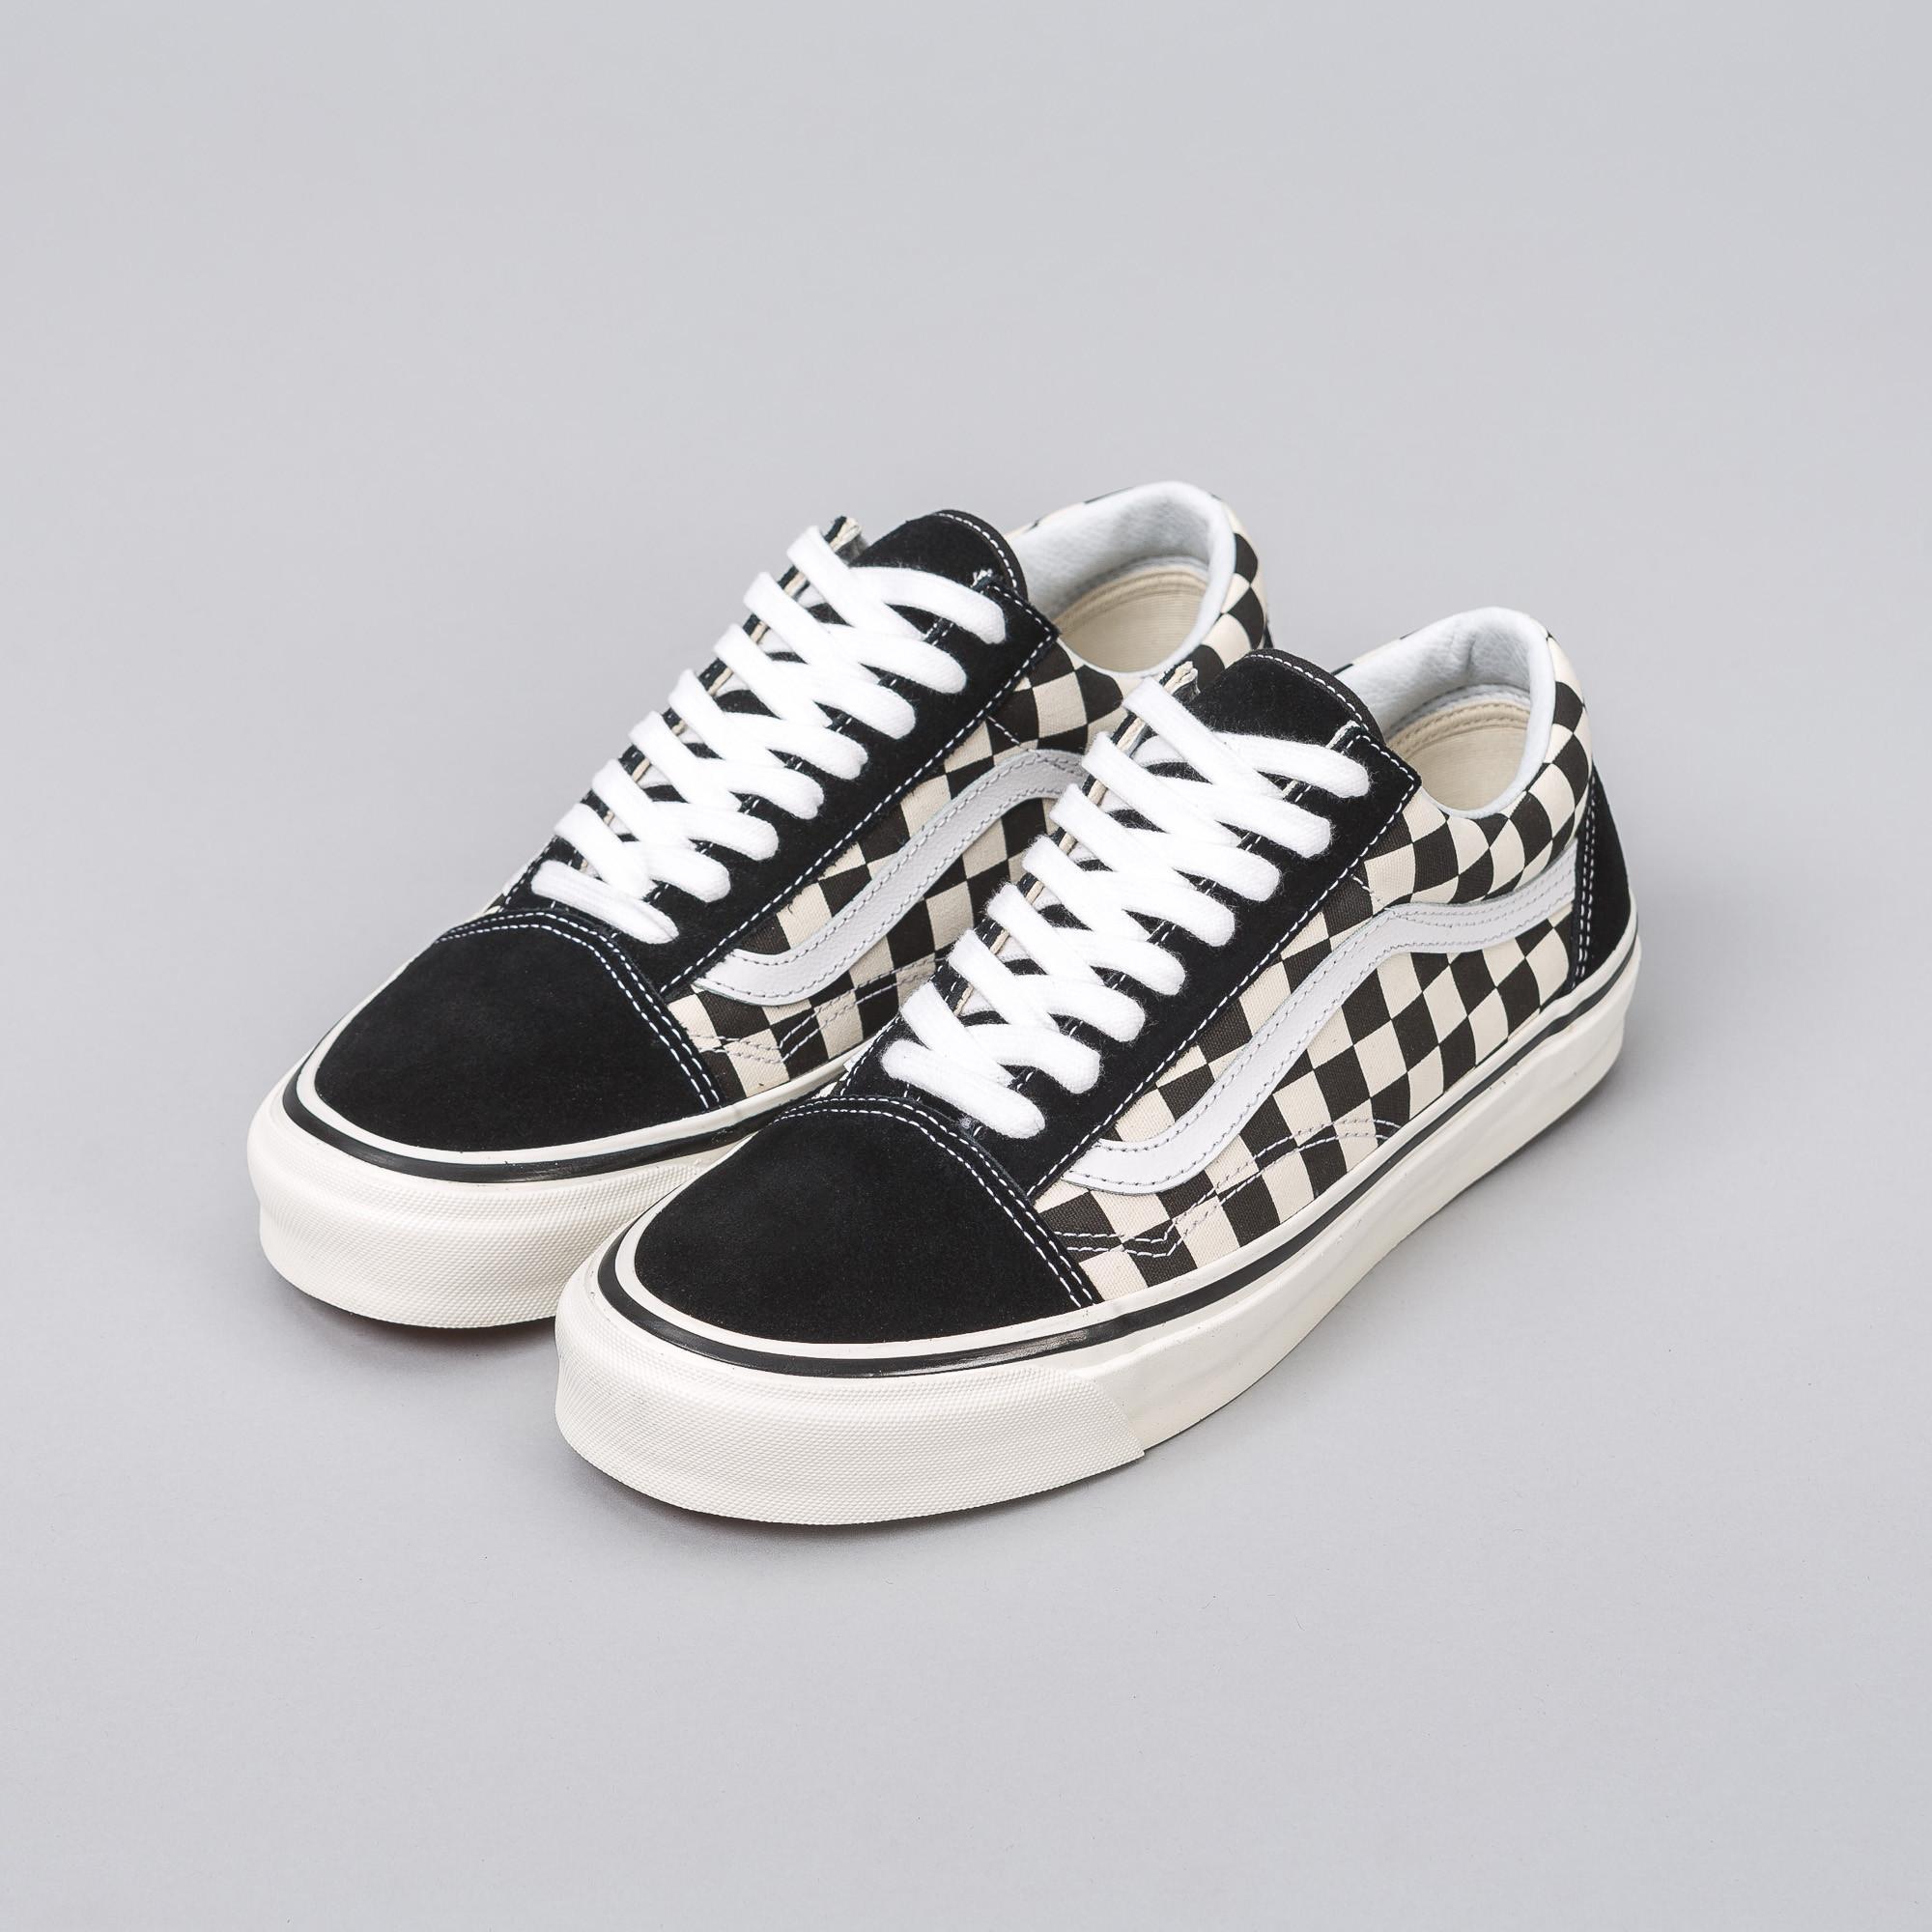 Lyst - Vans Old Skool 36 Dx Black Checkerboard for Men ff0879fc0